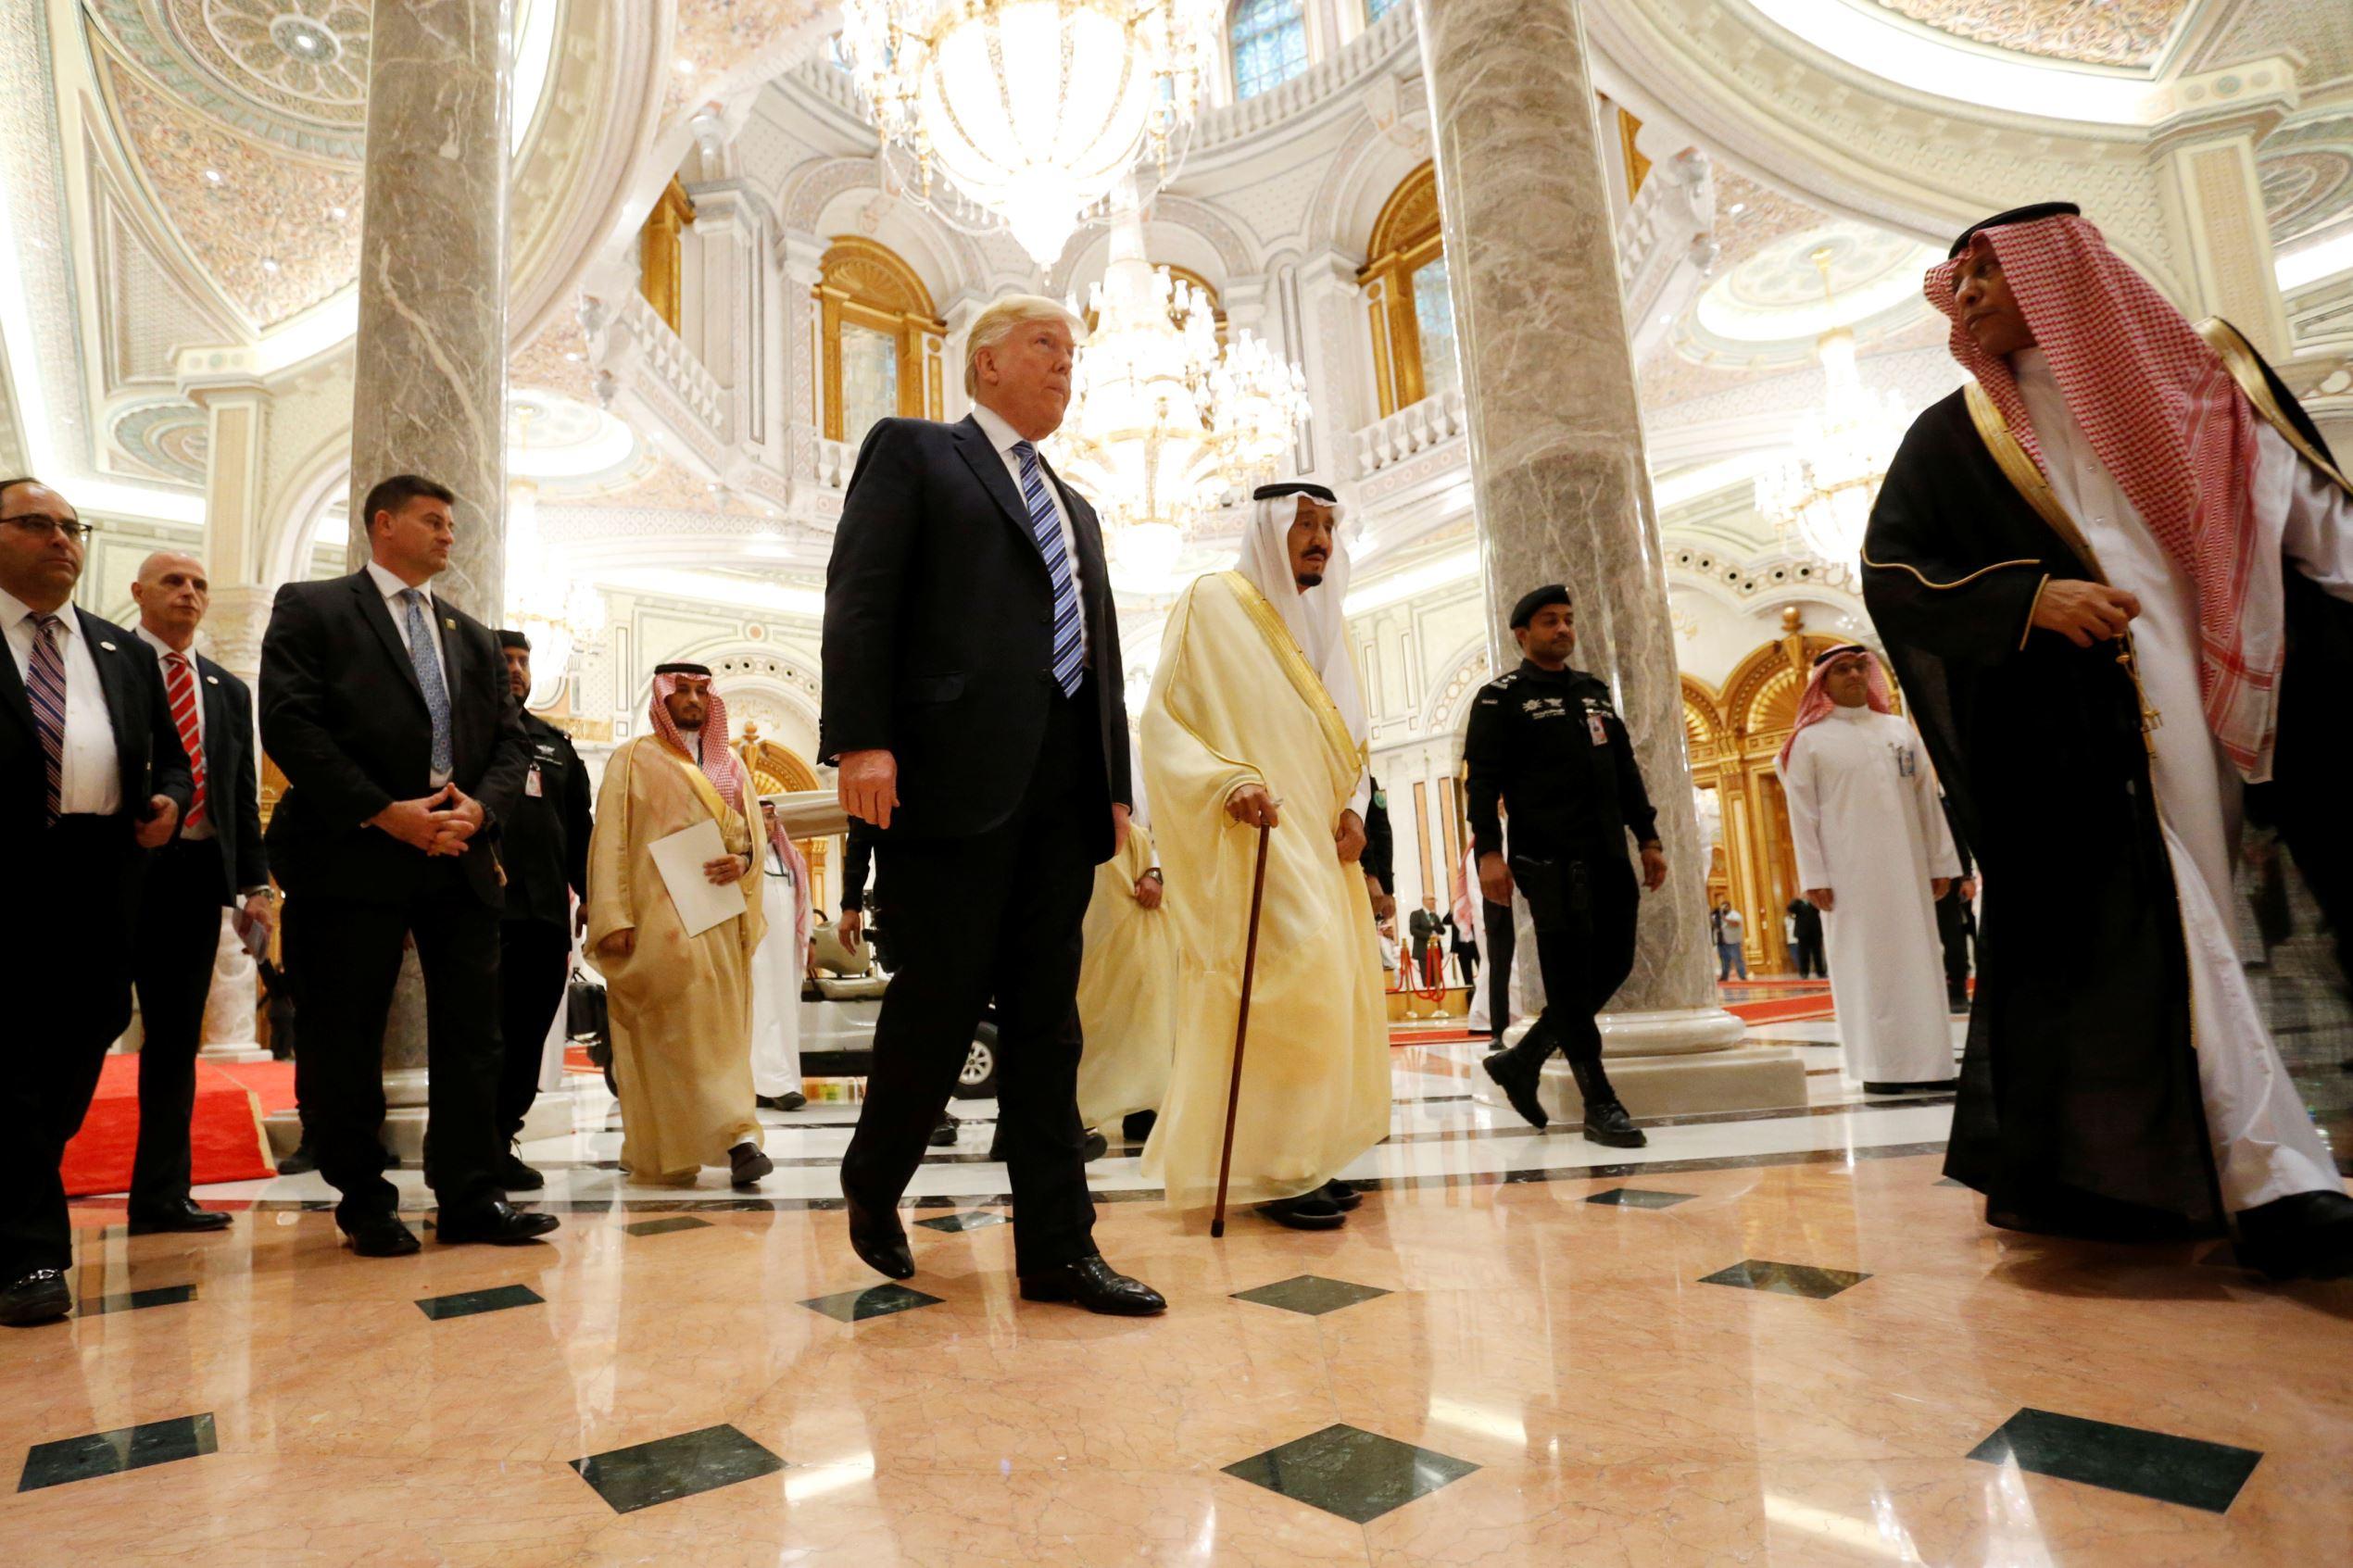 U.S. President Donald Trump (center L) walks with Saudi Arabia's King Salman bin Abdulaziz Al Saud (center R) to deliver remarks to the Arab Islamic American Summit in Riyadh, Saudi Arabia May 21, 2017.